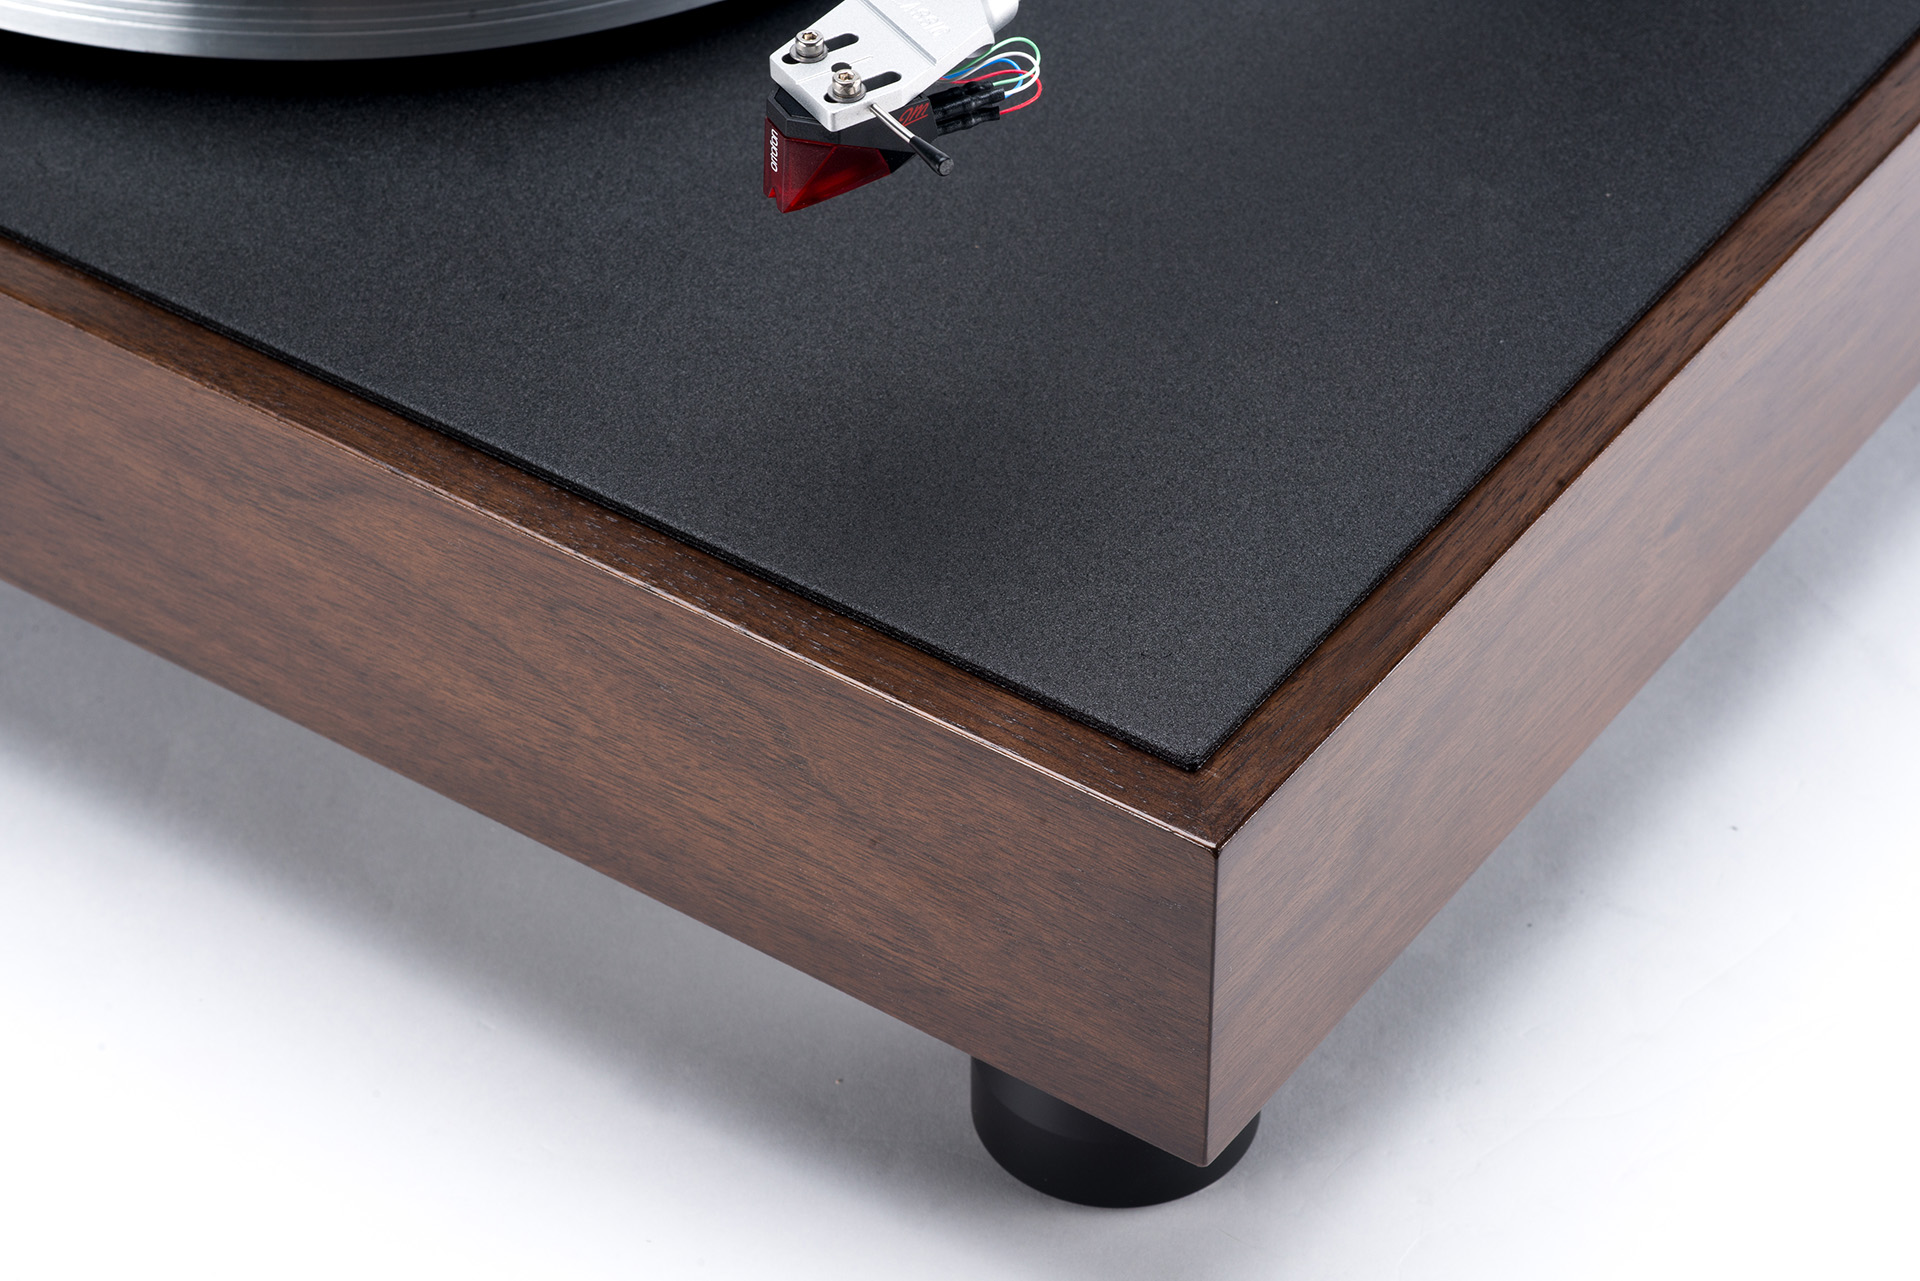 VPI Industries | Plattenspieler | VPI Classic